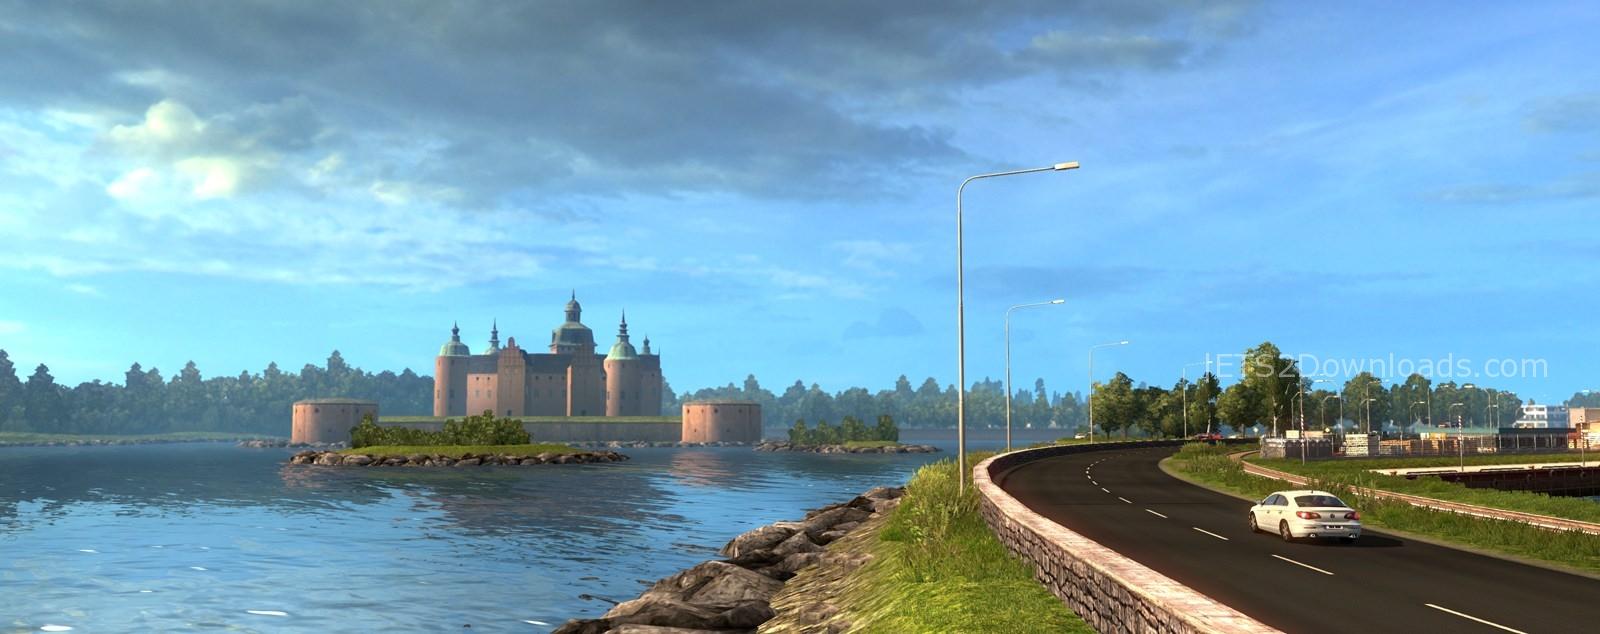 dlc-scandinavia-1